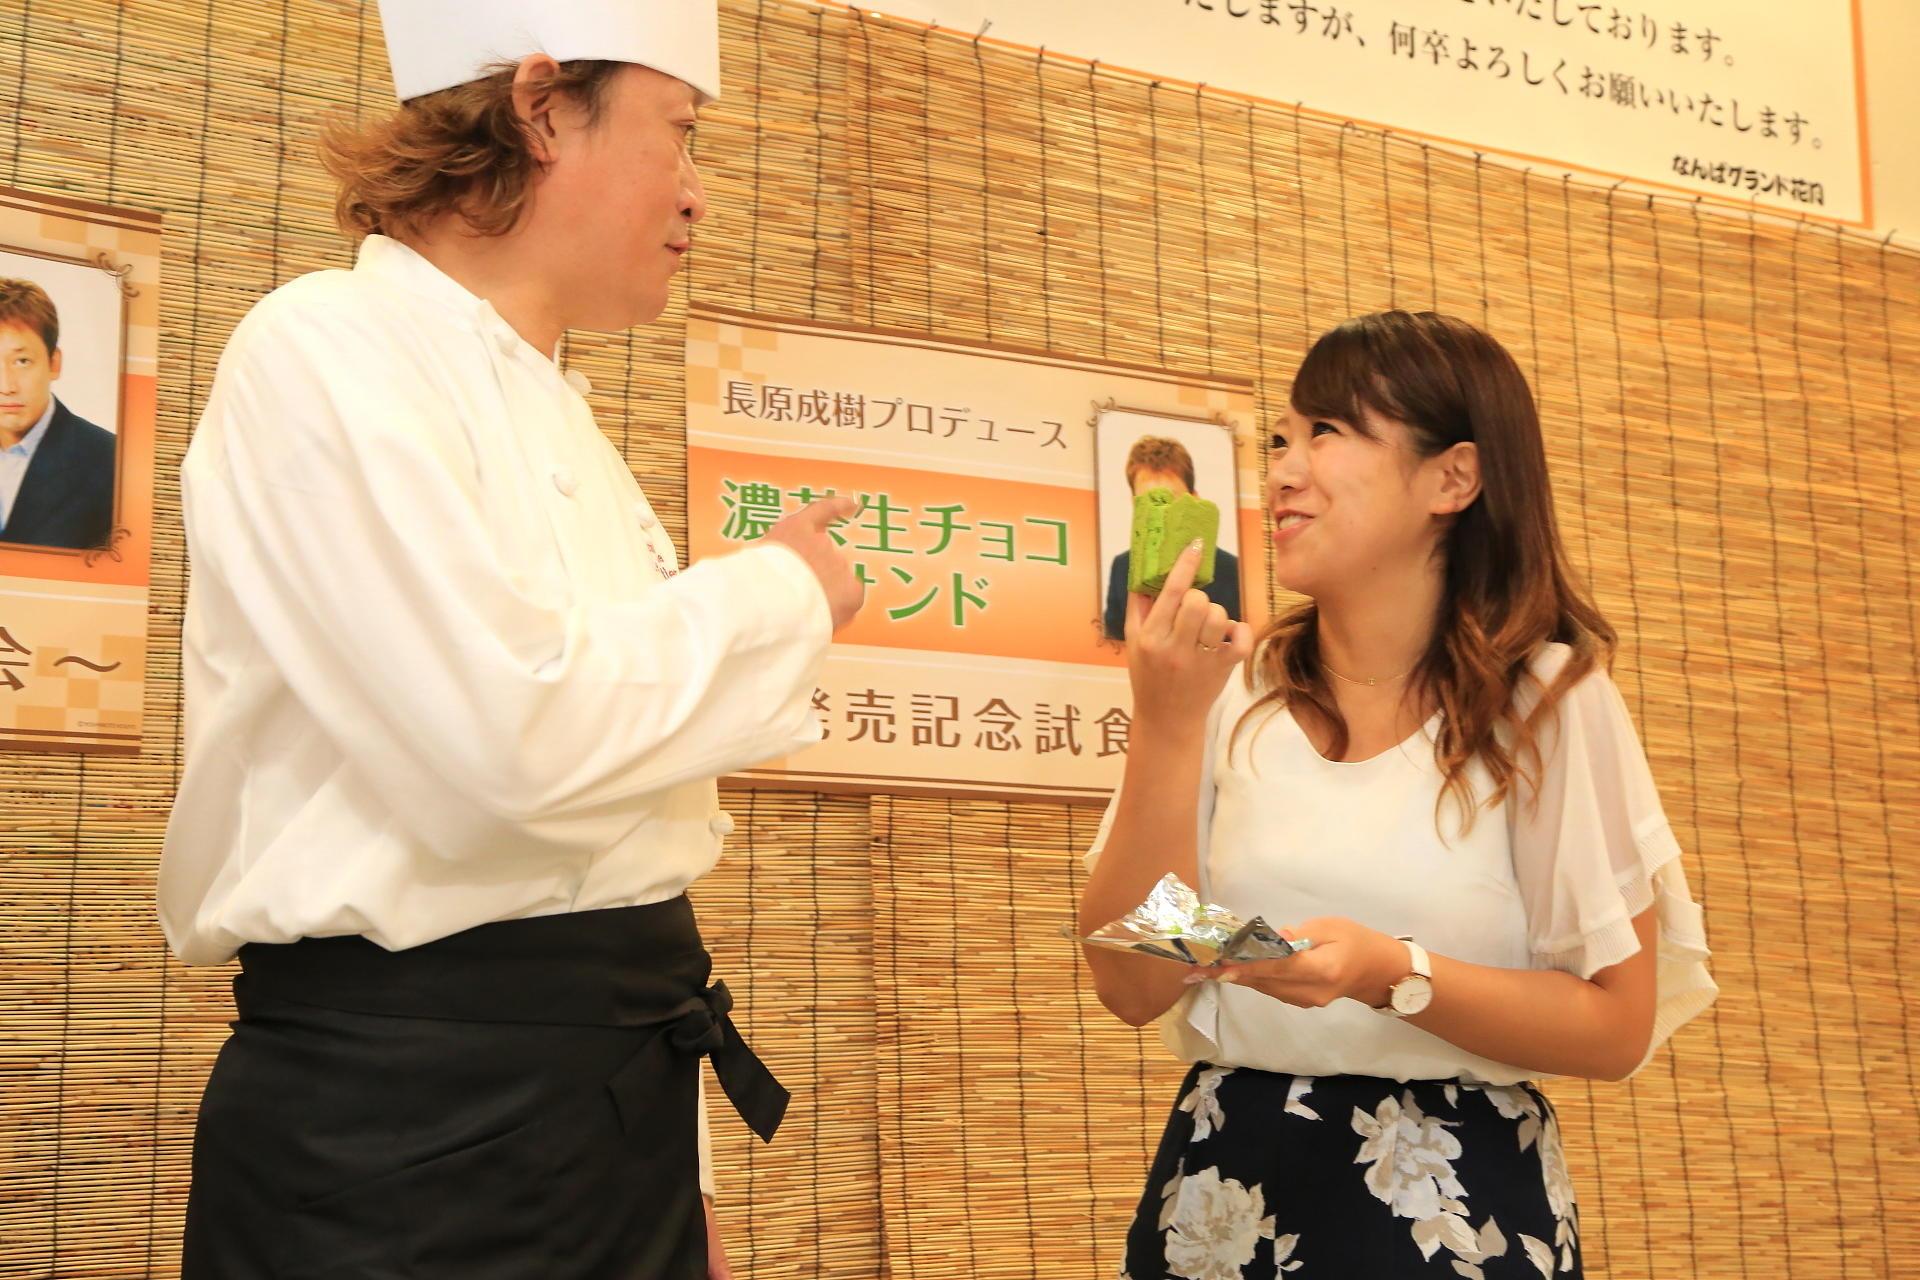 http://news.yoshimoto.co.jp/20170815163020-a6cf7fb6a48761d450b2aaba2f8010d79e92b284.jpg